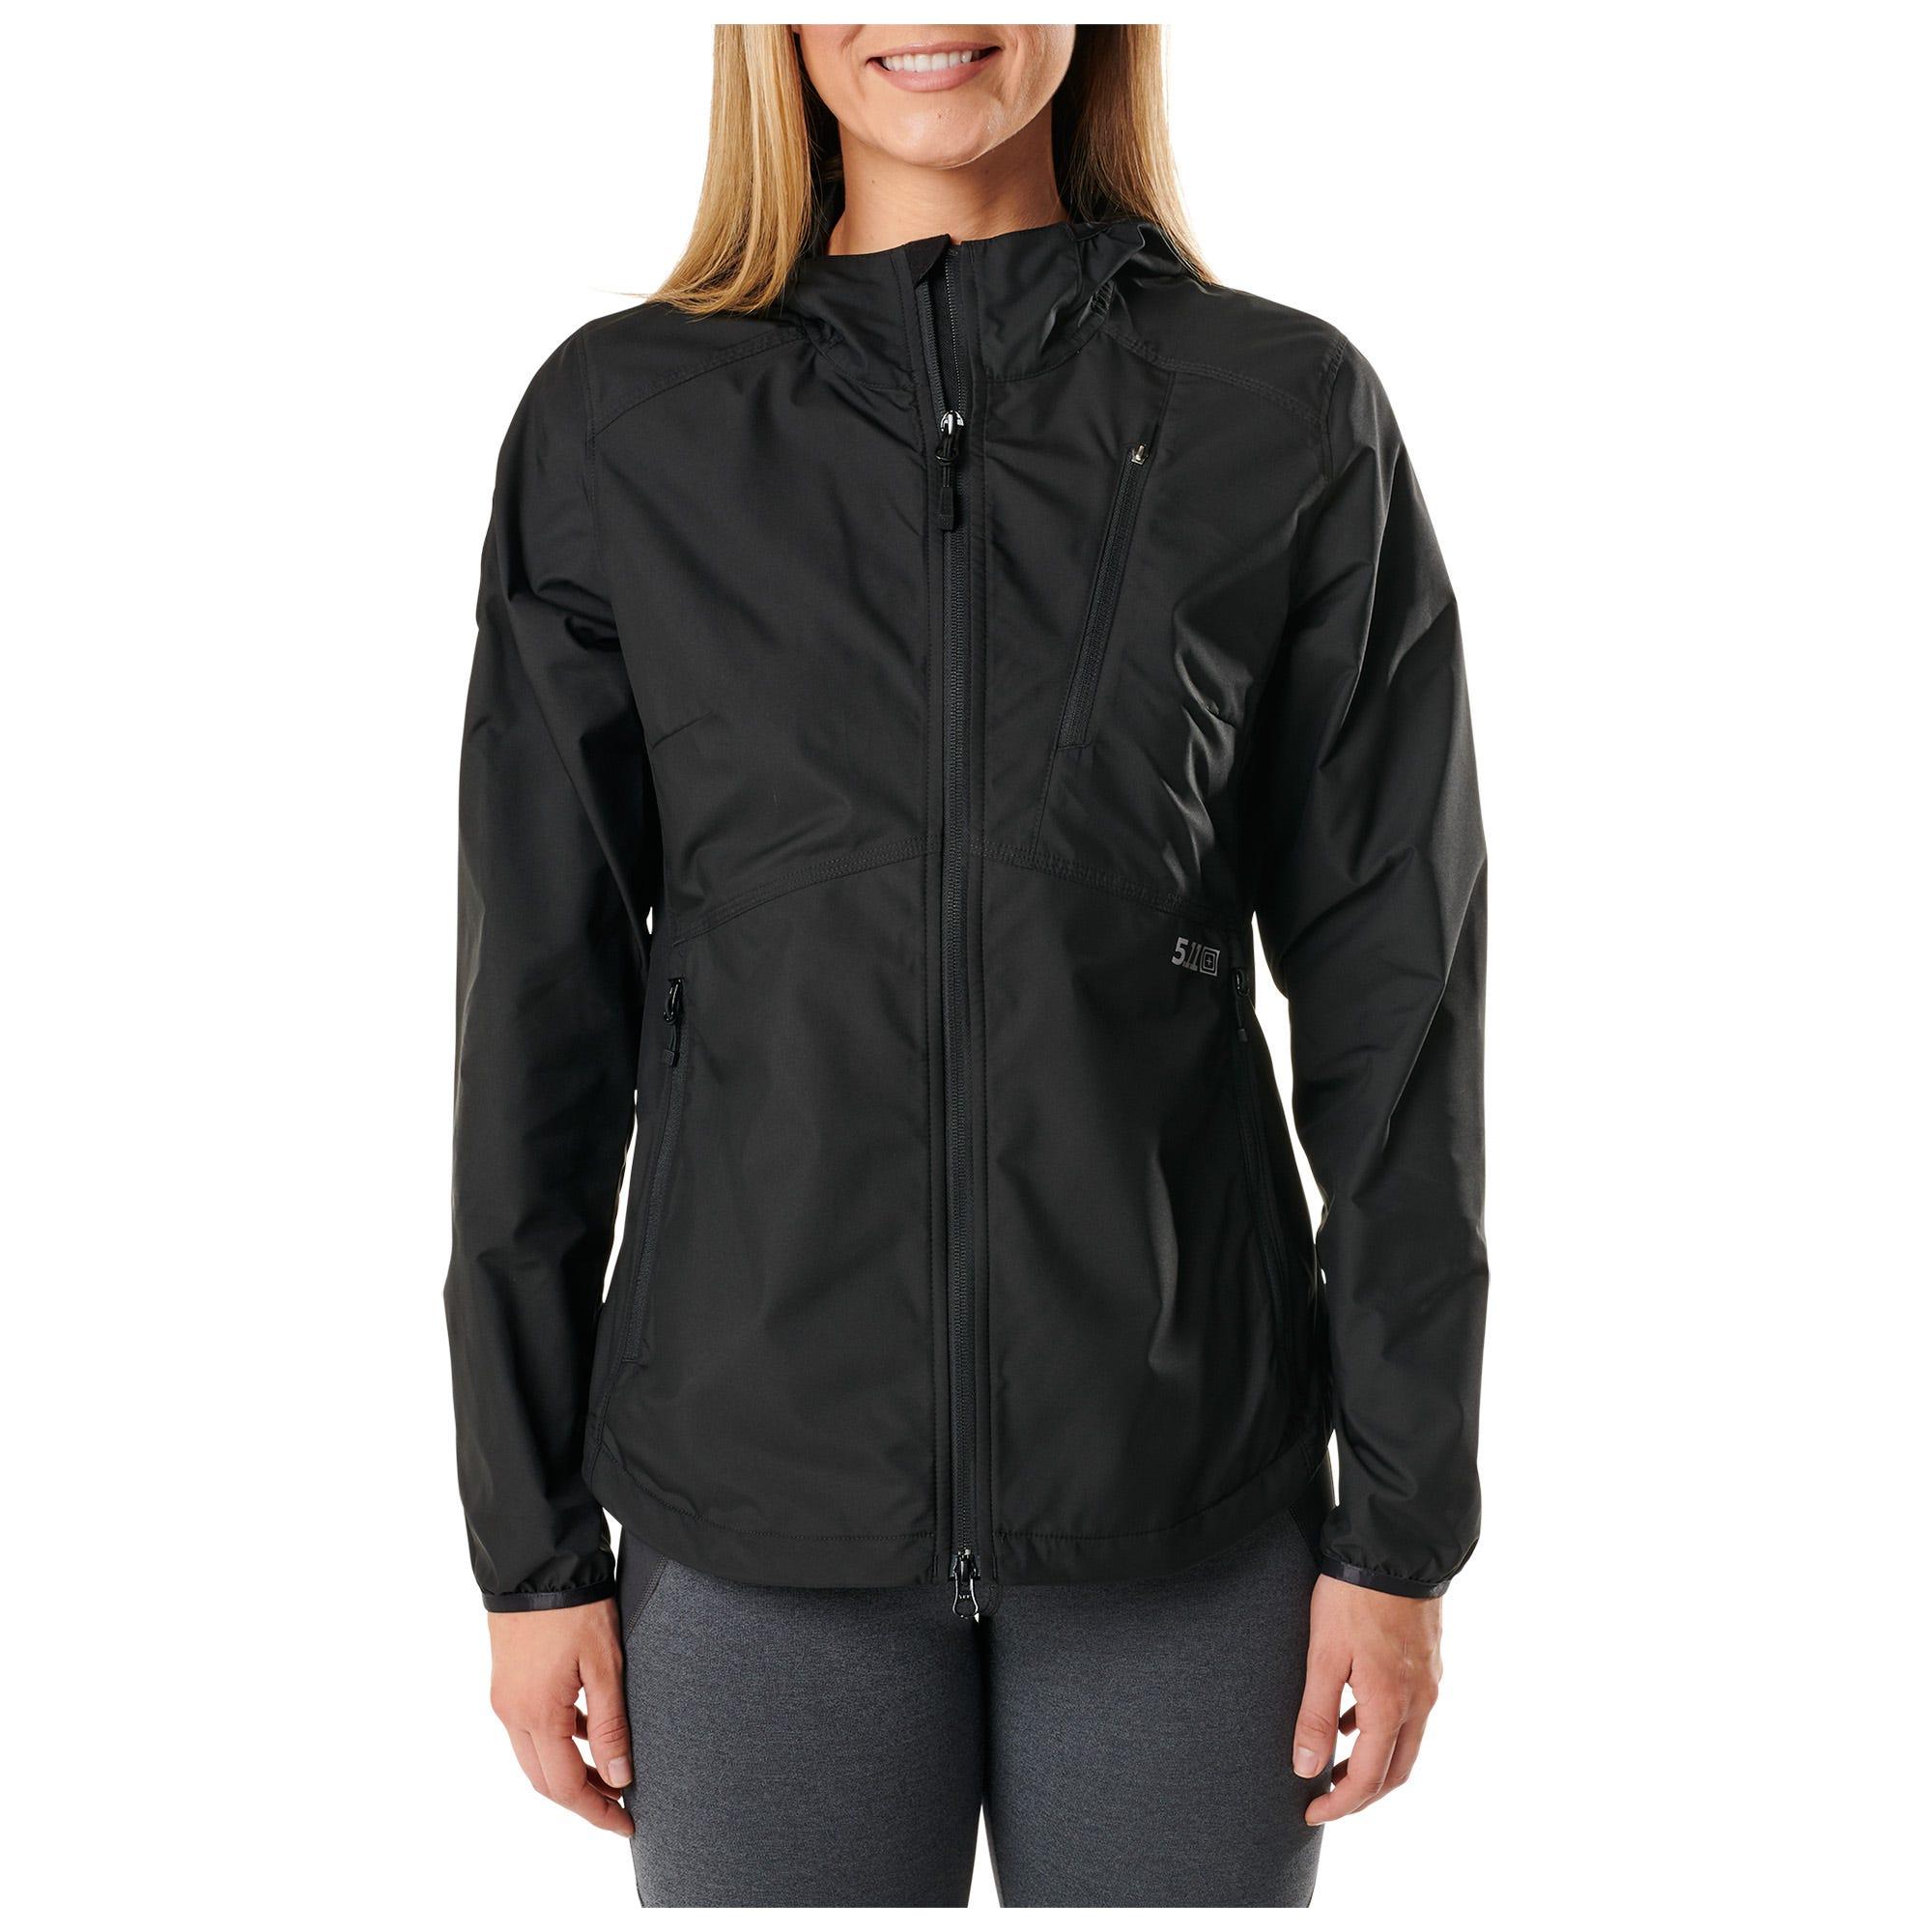 5.11 Tactical Women's Cascadia Windbreaker Packable Jacket (Grey)